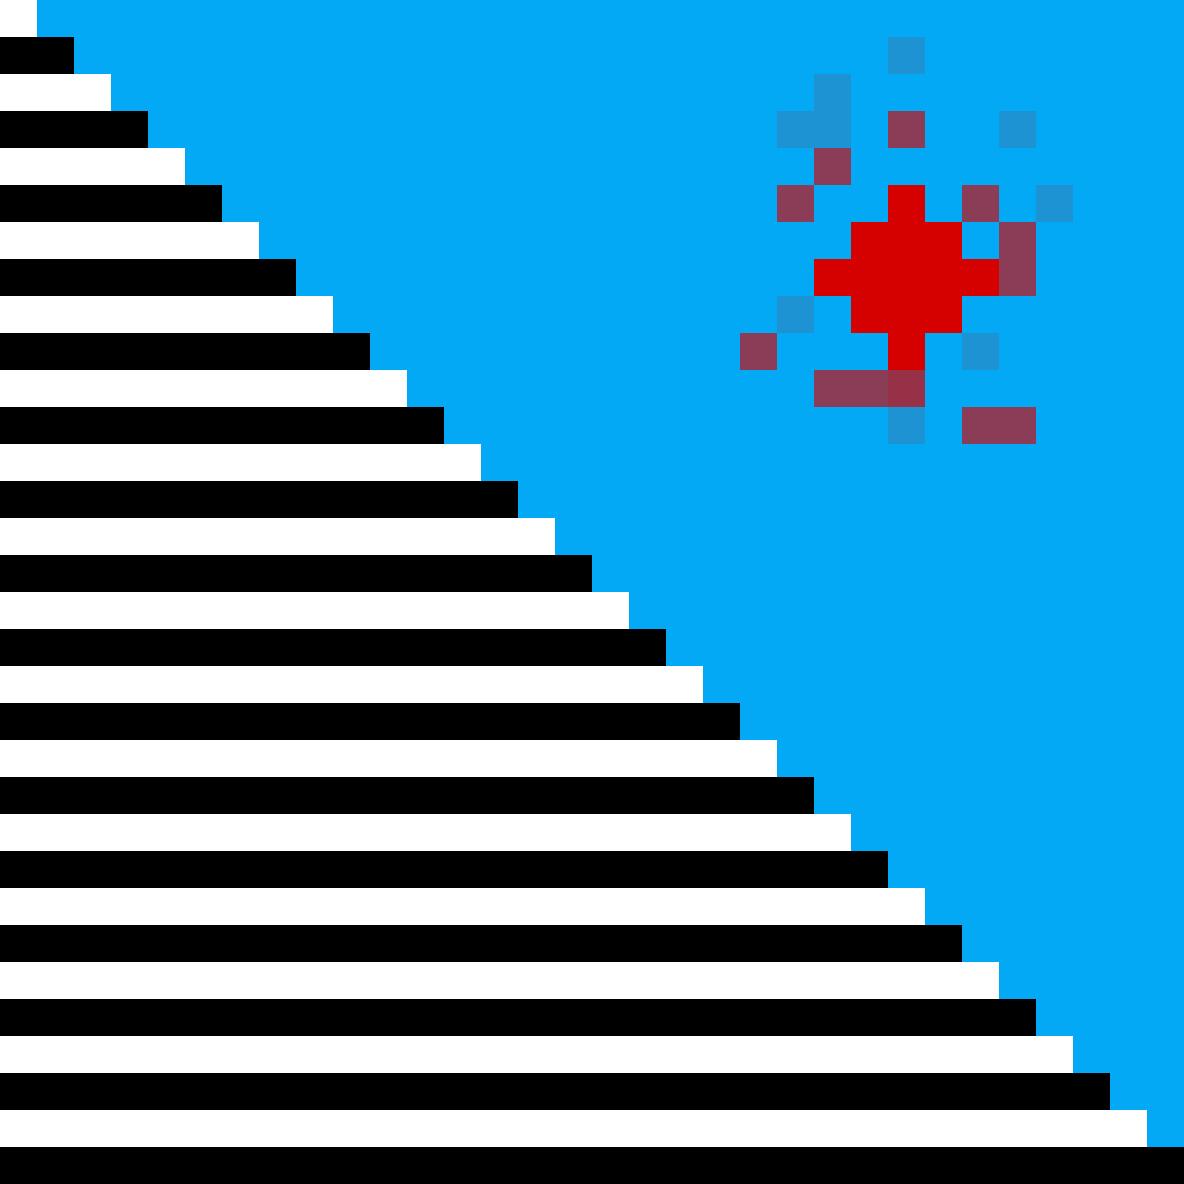 pattern 2 by Nemo123